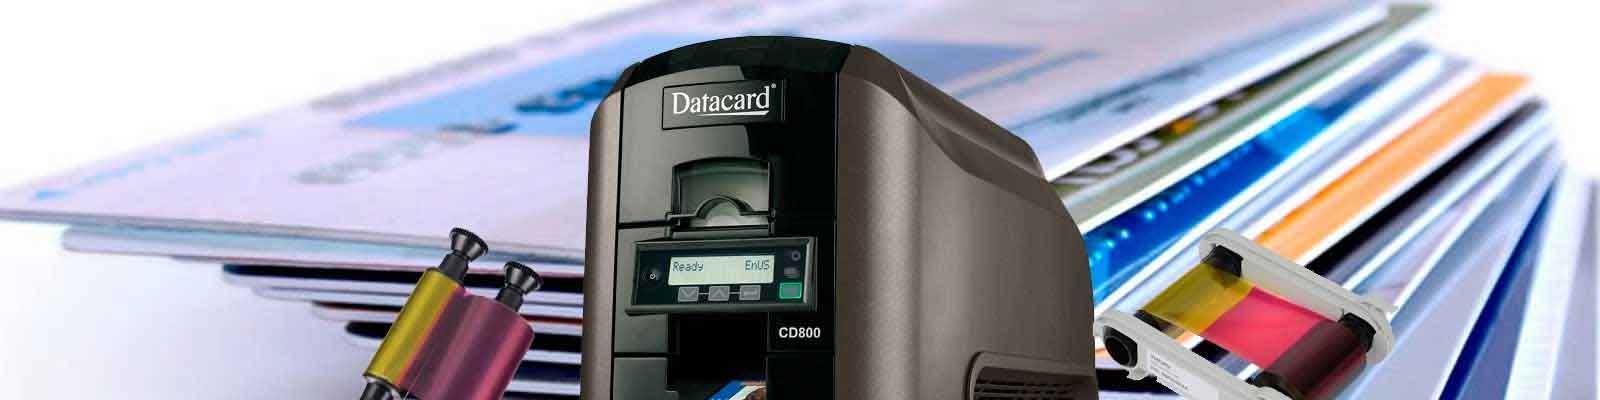 Consumibles Datacard